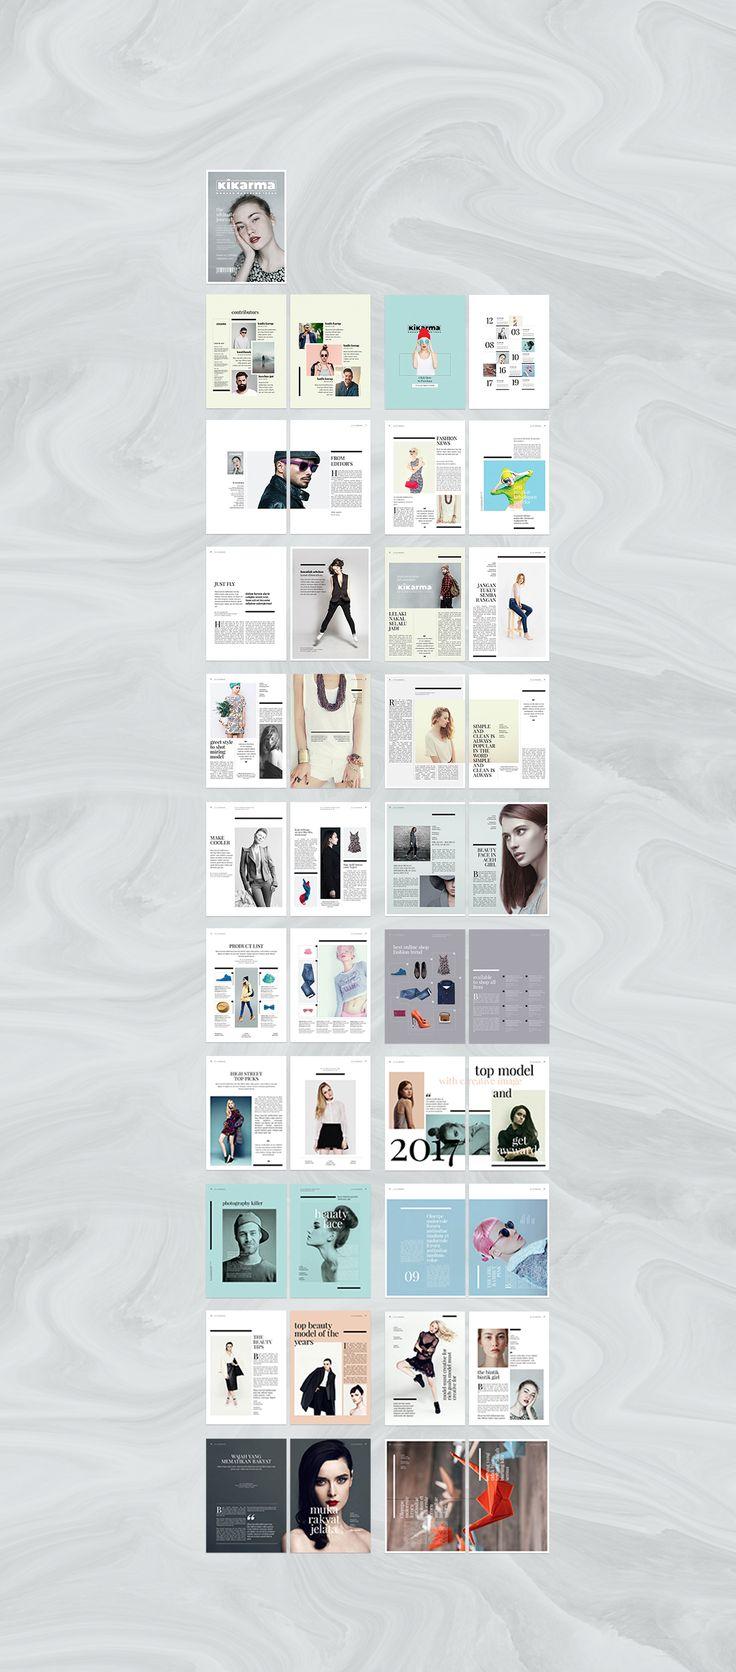 lookbook template,brochure template, folio template,modern magazine,hipster magazine,boho magazine,photography folio,fashion magazine,fashion folio, portfolio template,publications, magazine,portfolio,hipster,boho, photography,fashion,modern,…